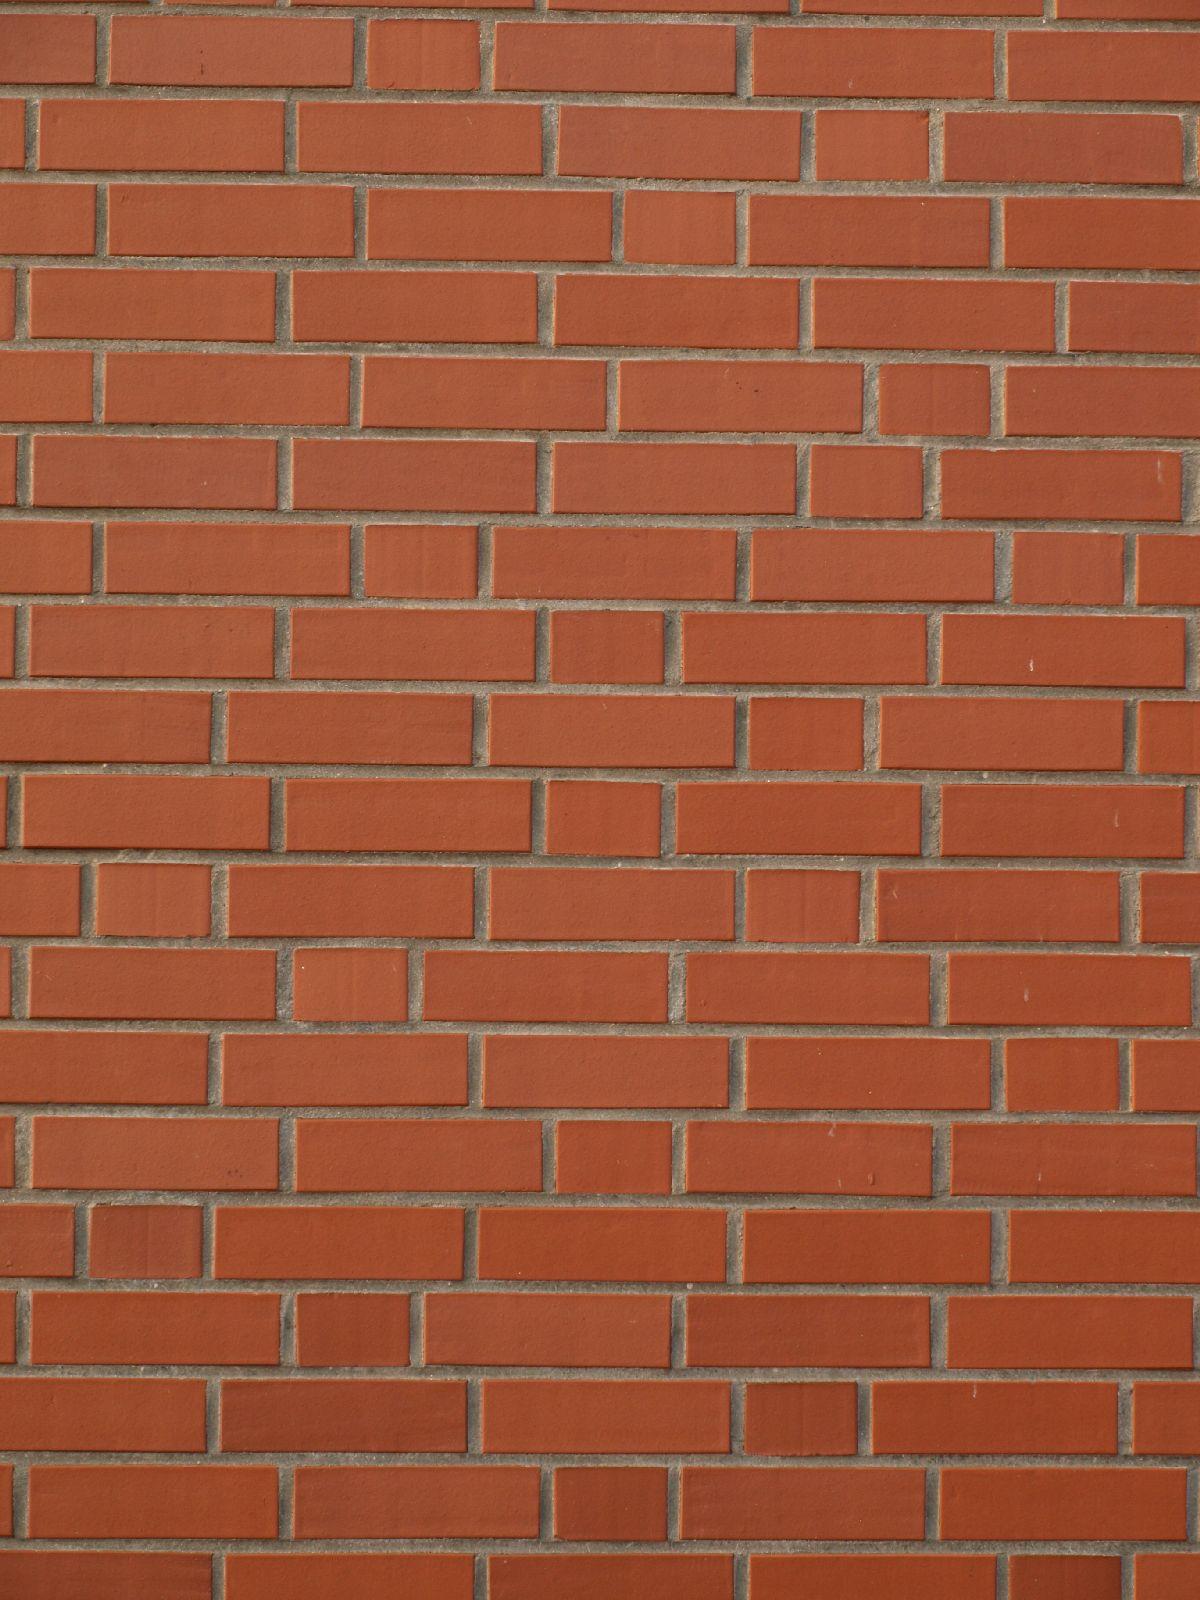 Brick_Texture_A_PB080986